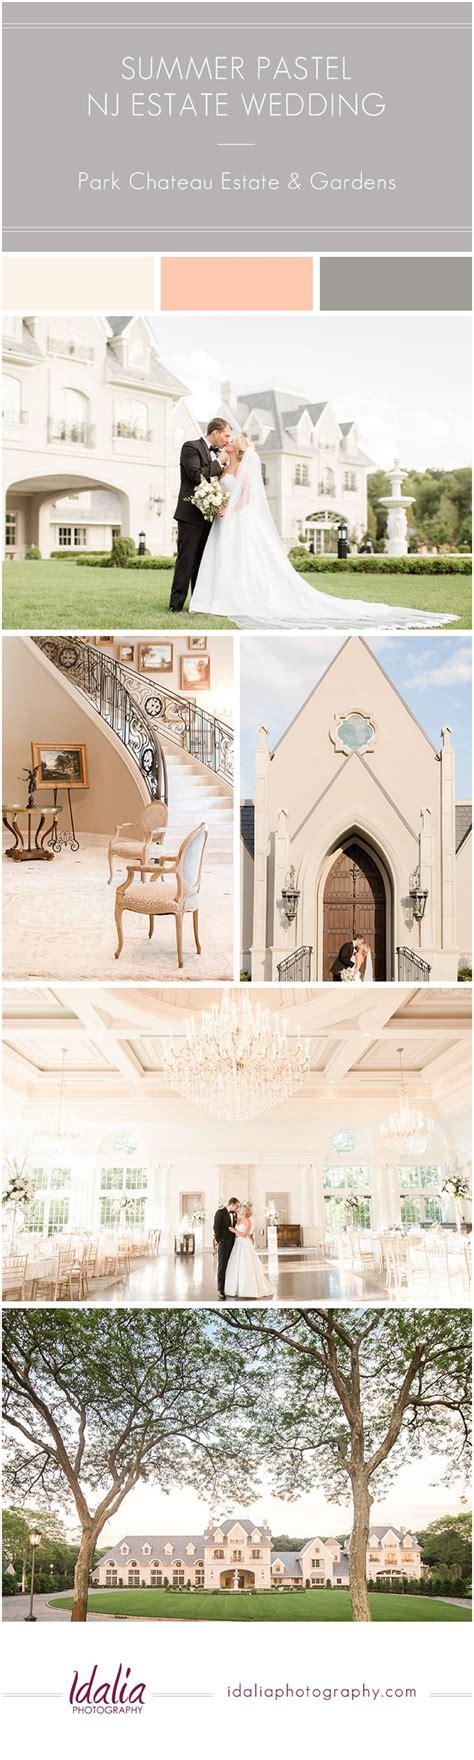 park chateau estate wedding juliana and joseph